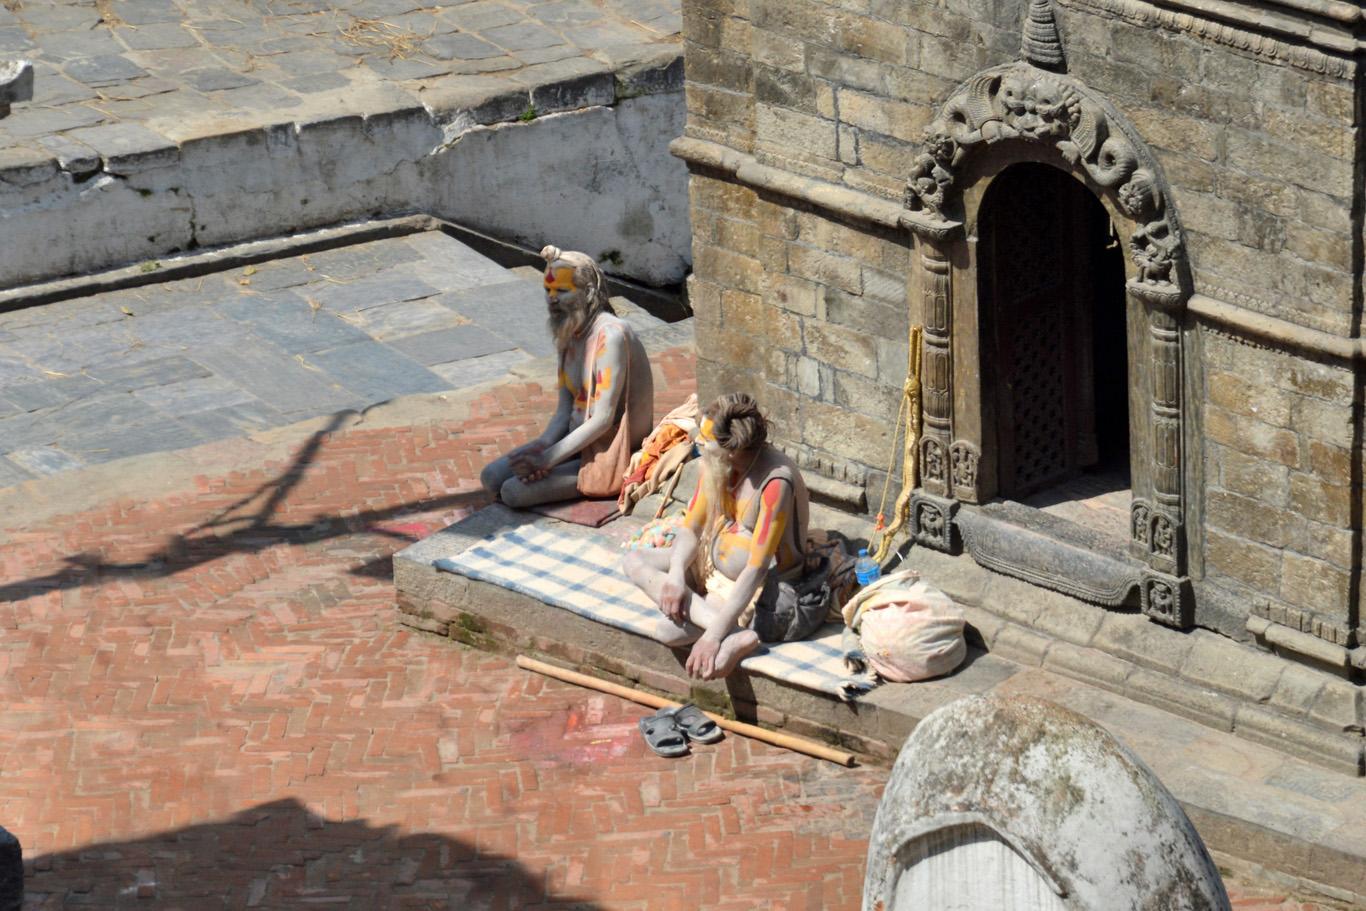 Sadhu - the holy men